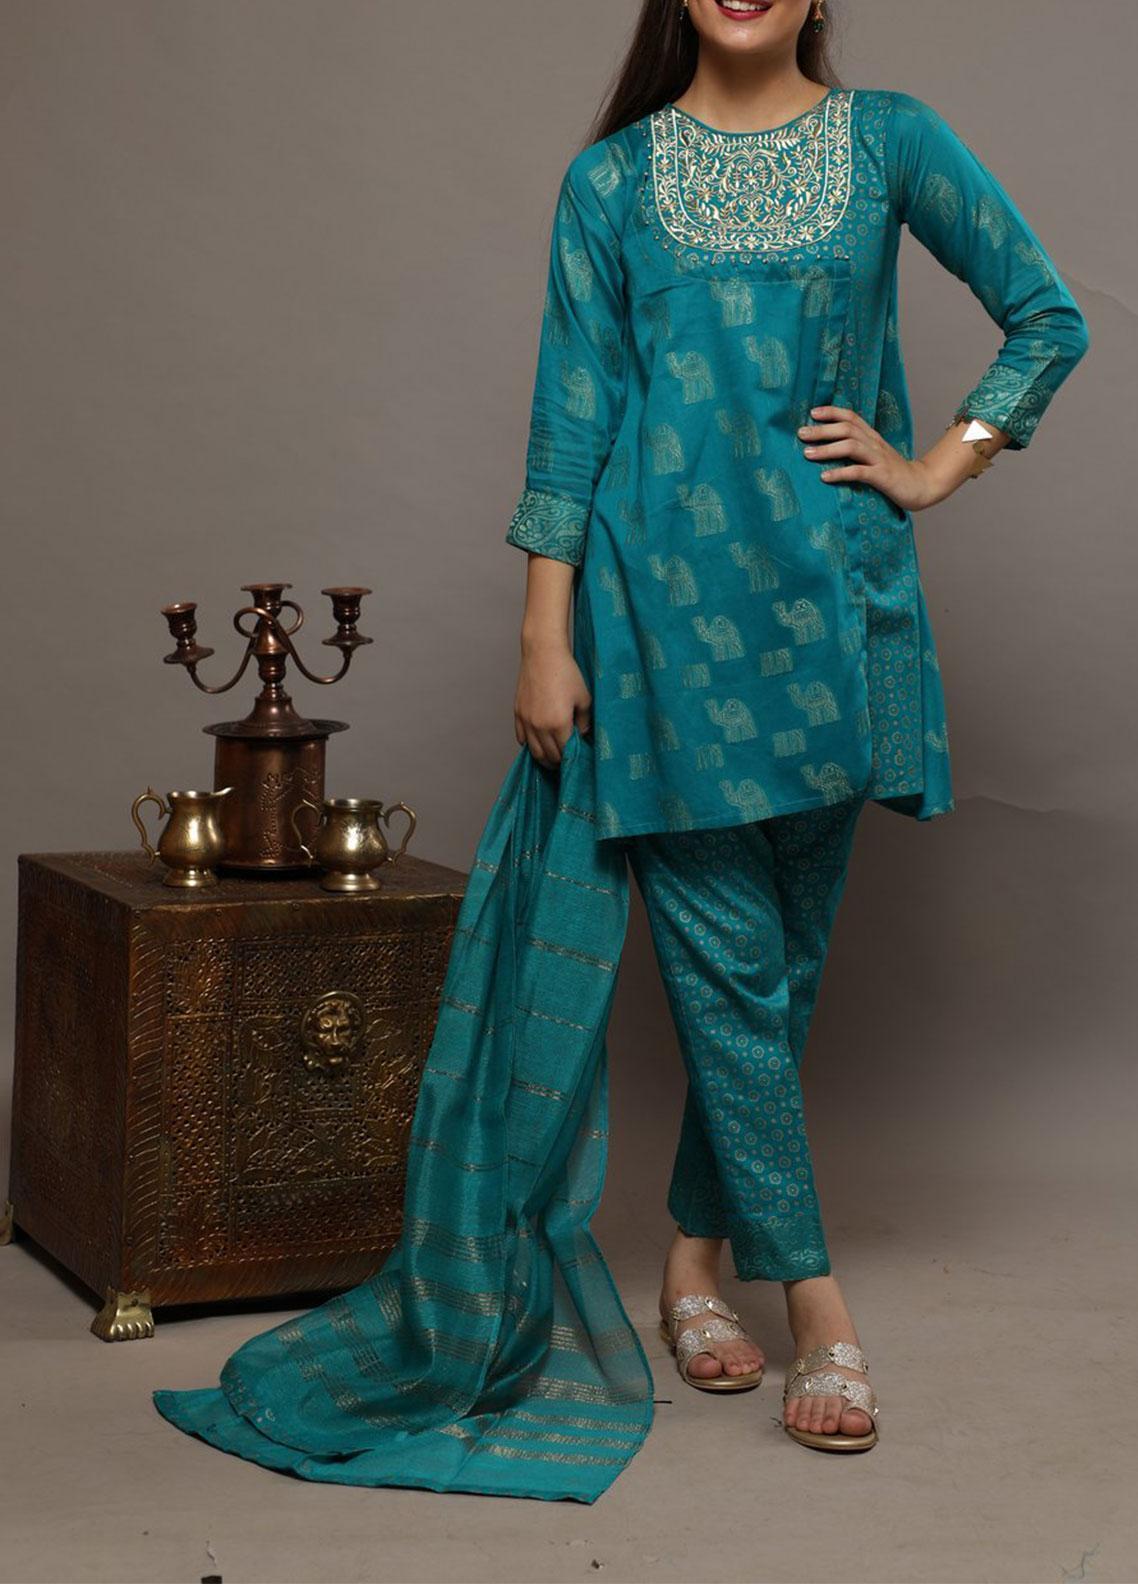 Senorita Cotton Casual 3 Piece Suit for Girls -  GBD-01272 TURQUOISE GREEN